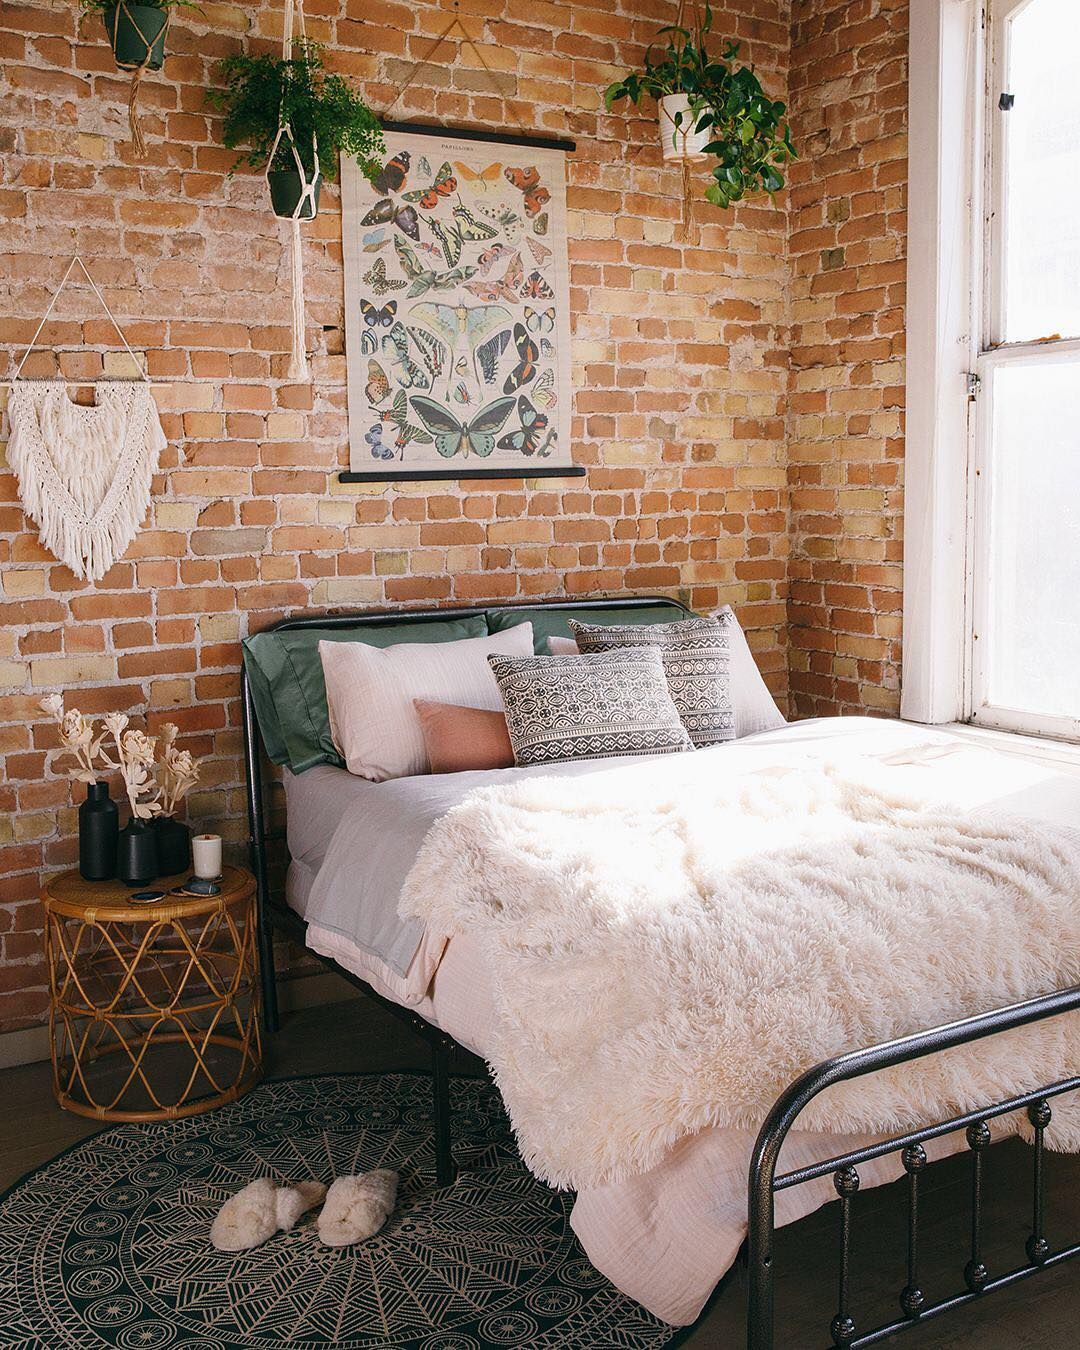 interiordesign home bedroom boho homedecor with on brick wall id=83743